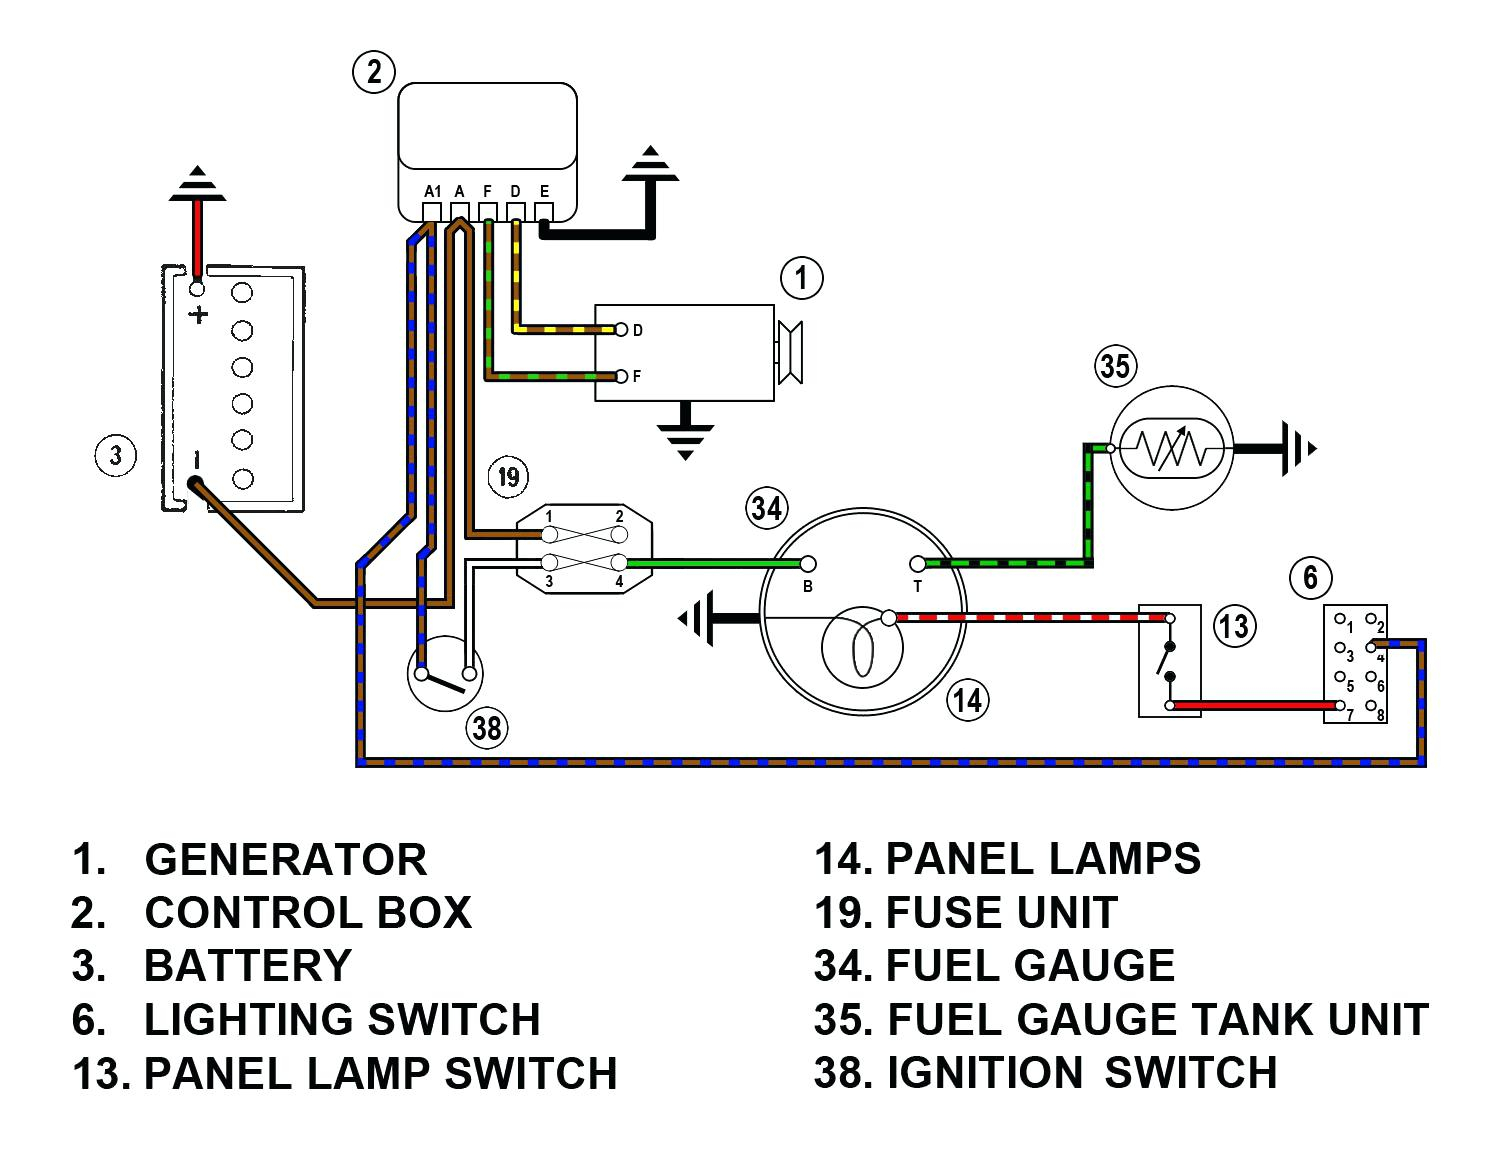 hawke dump trailer wiring diagram Download-gooseneck wiring diagram Download Gooseneck Trailer Wiring Diagram Elegant Dump Trailer Wiring Diagram Hawke Travel 10-p